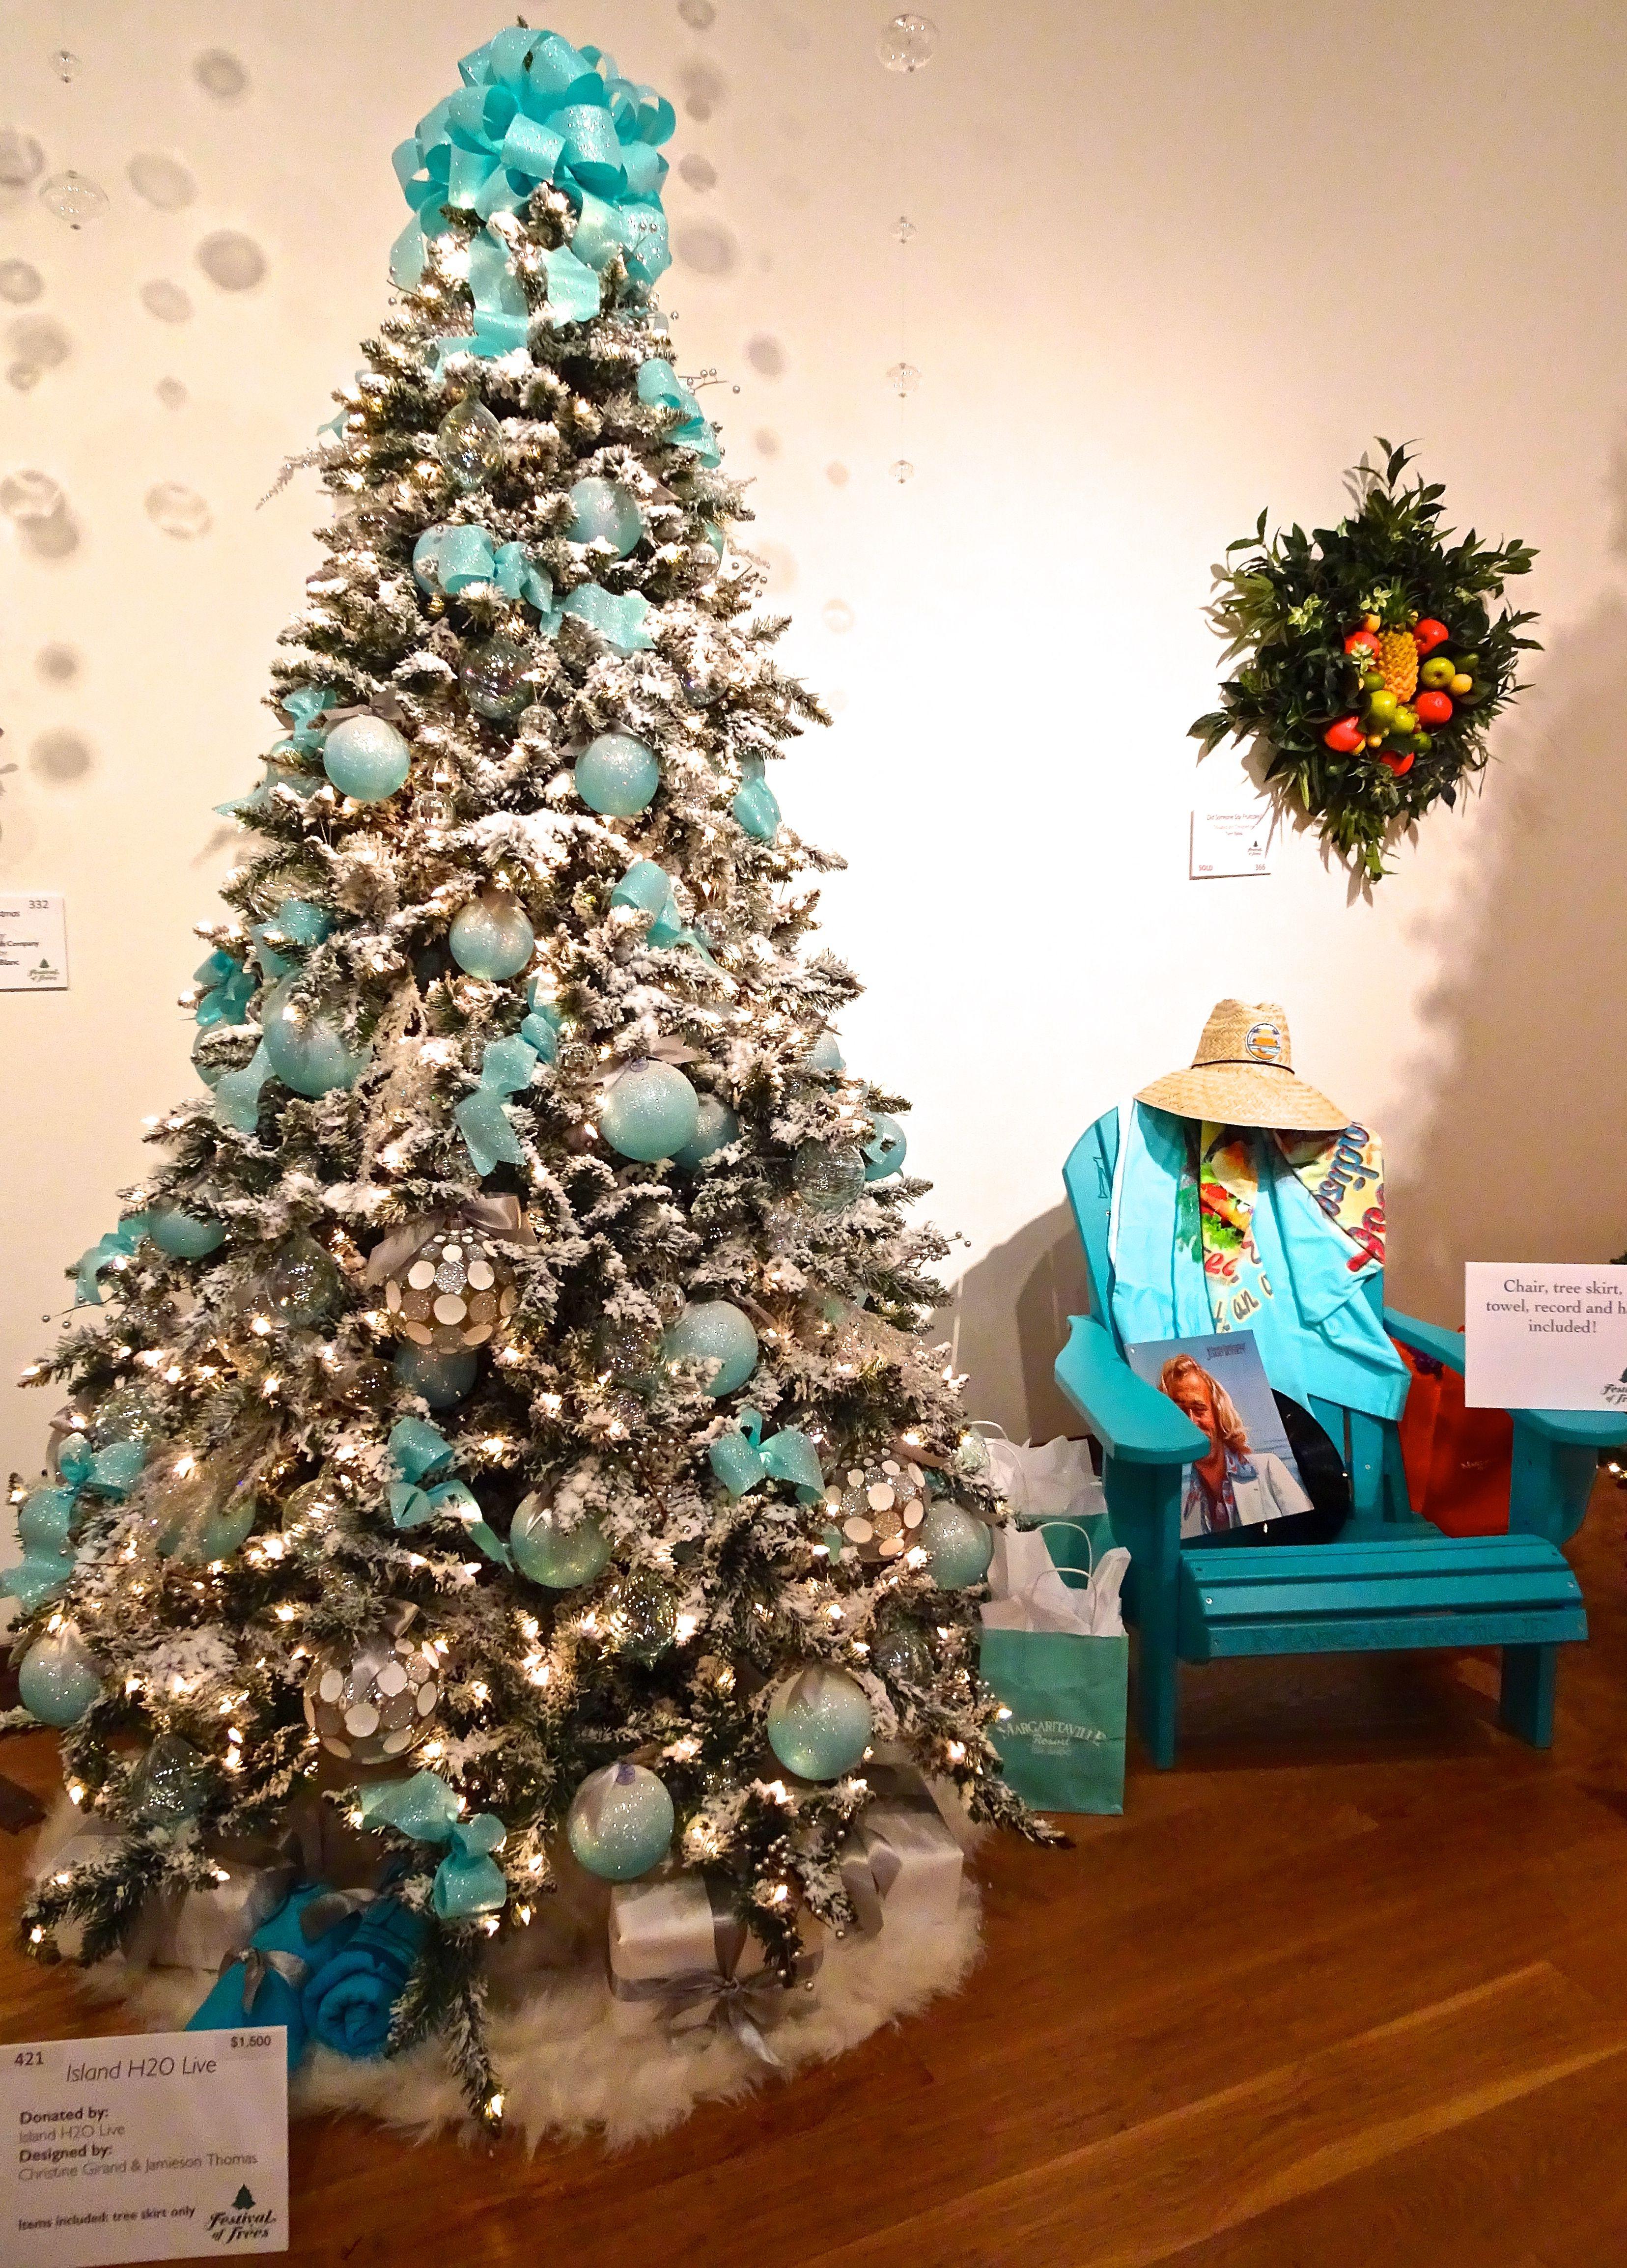 Donate Artificial Christmas Tree Near Me